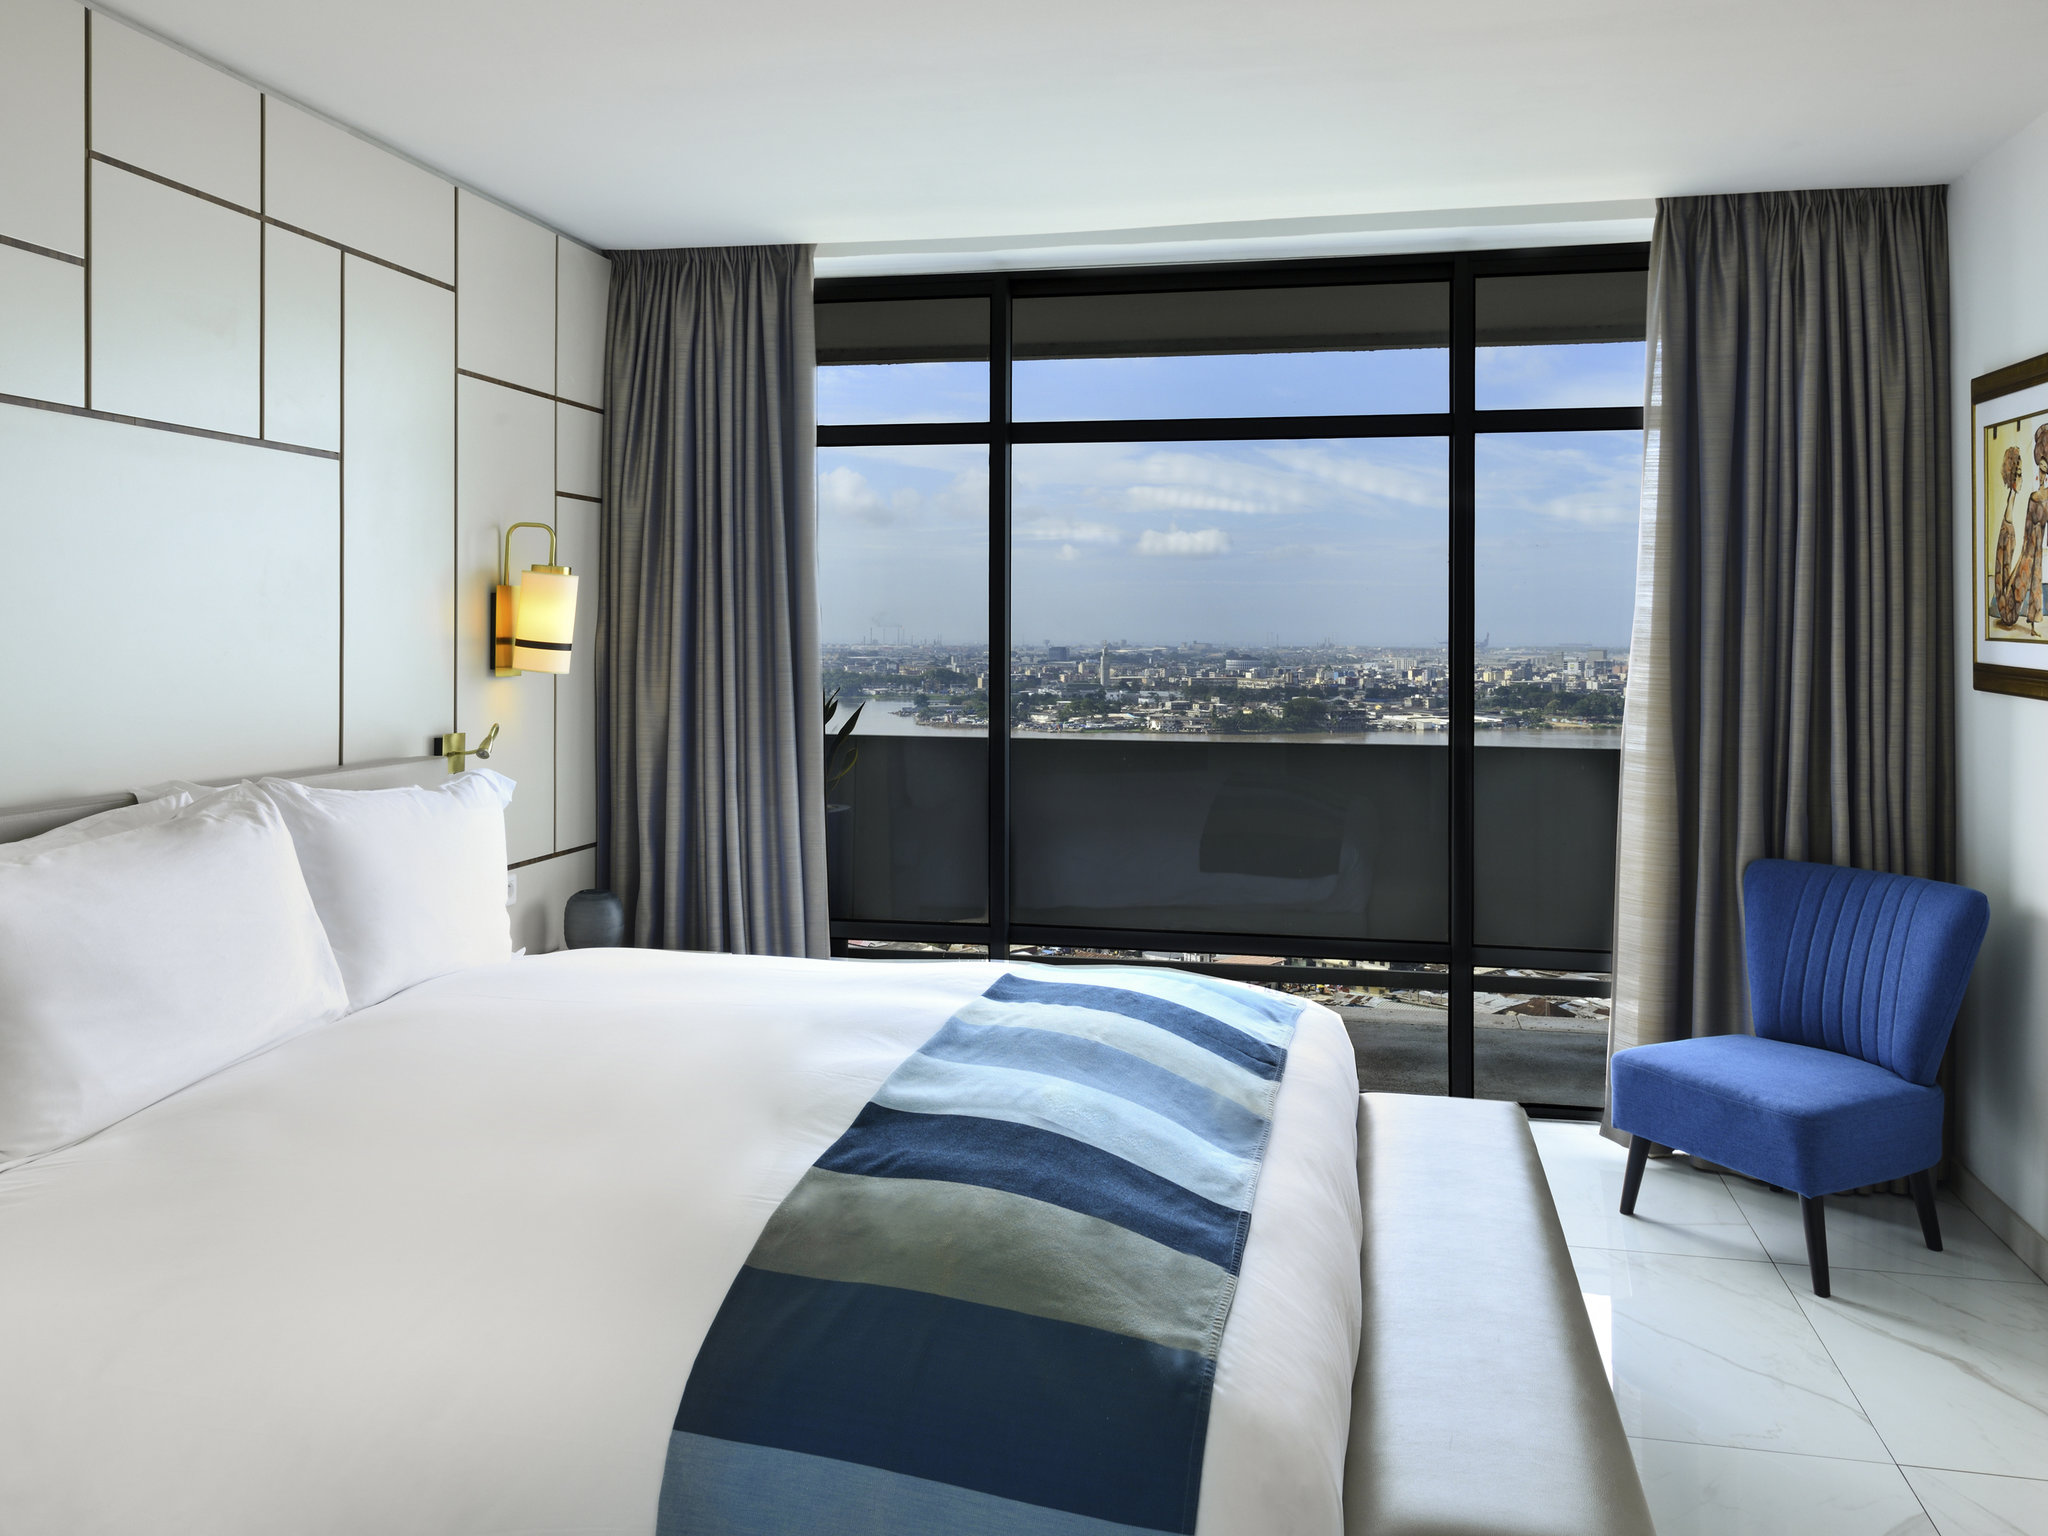 فندق - Sofitel Abidjan Hôtel Ivoire